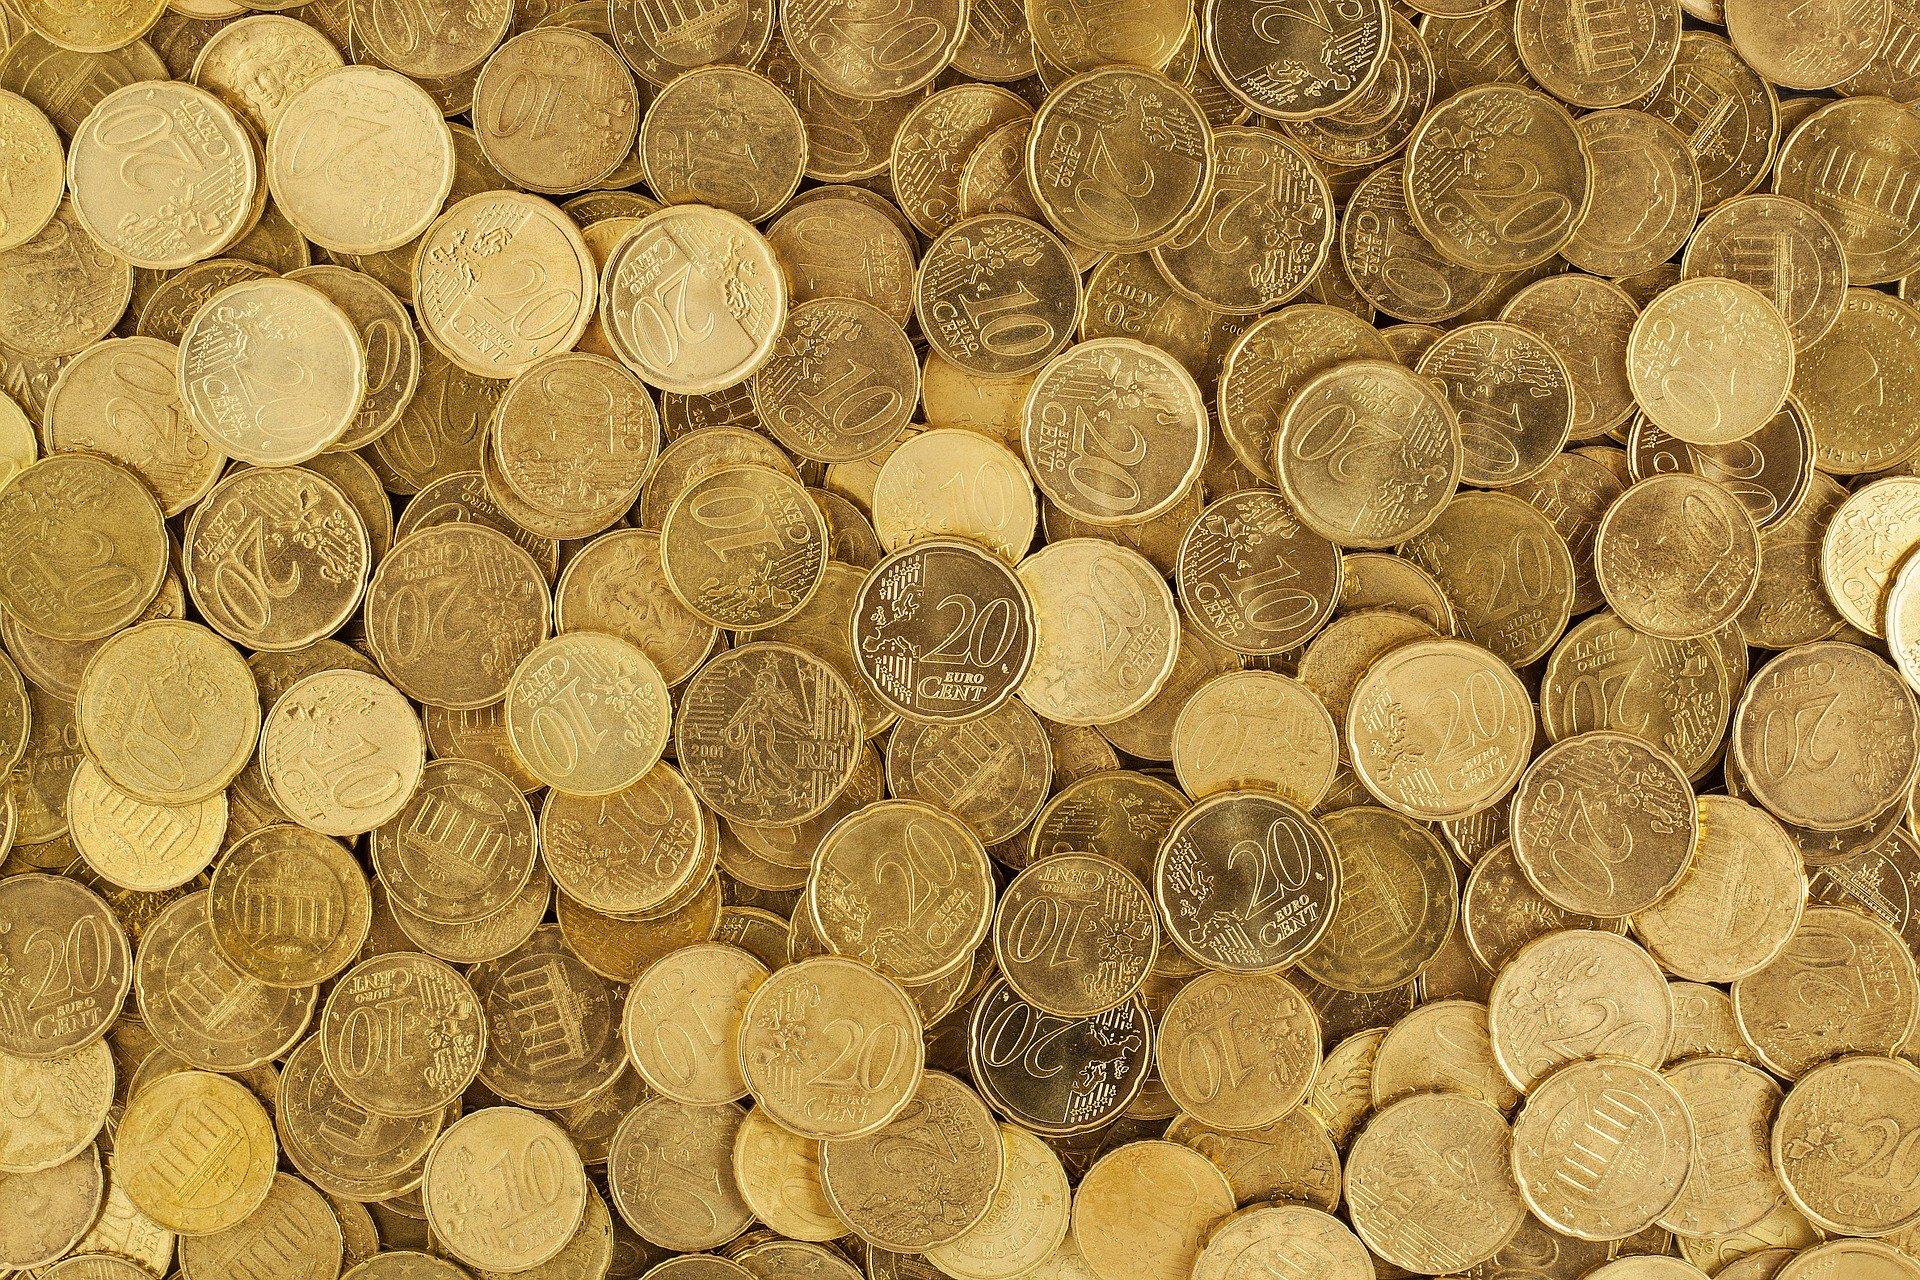 Penge_lån